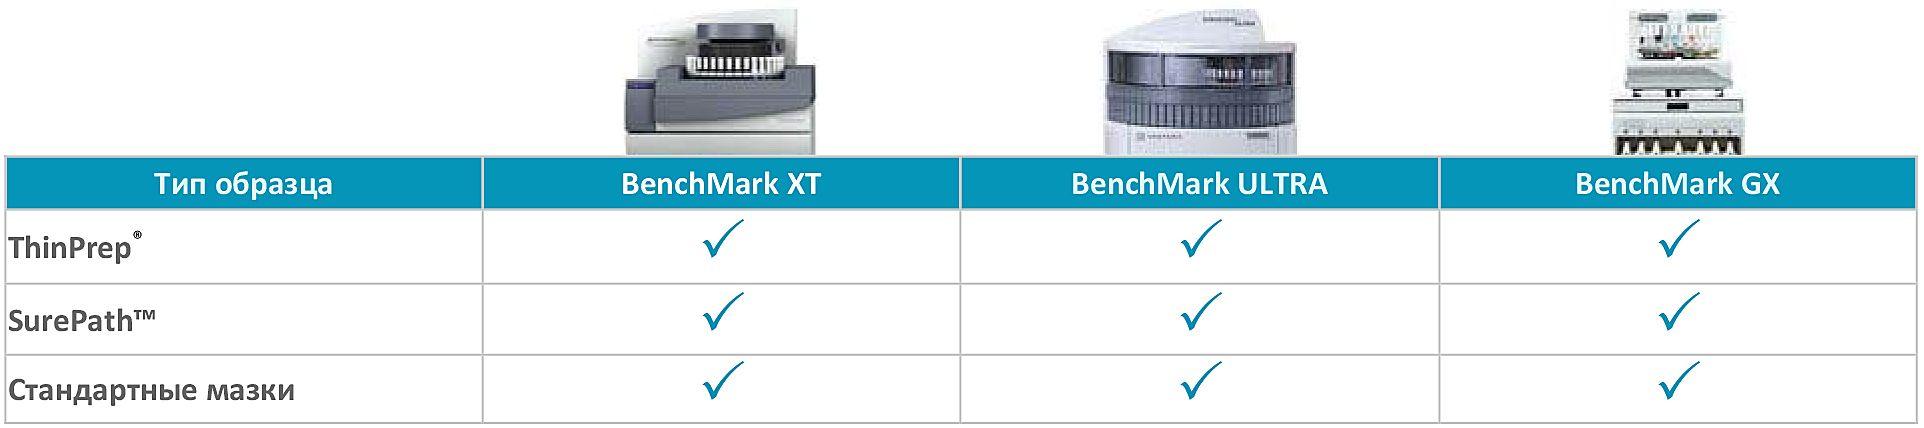 Схема CINtec BenchMark